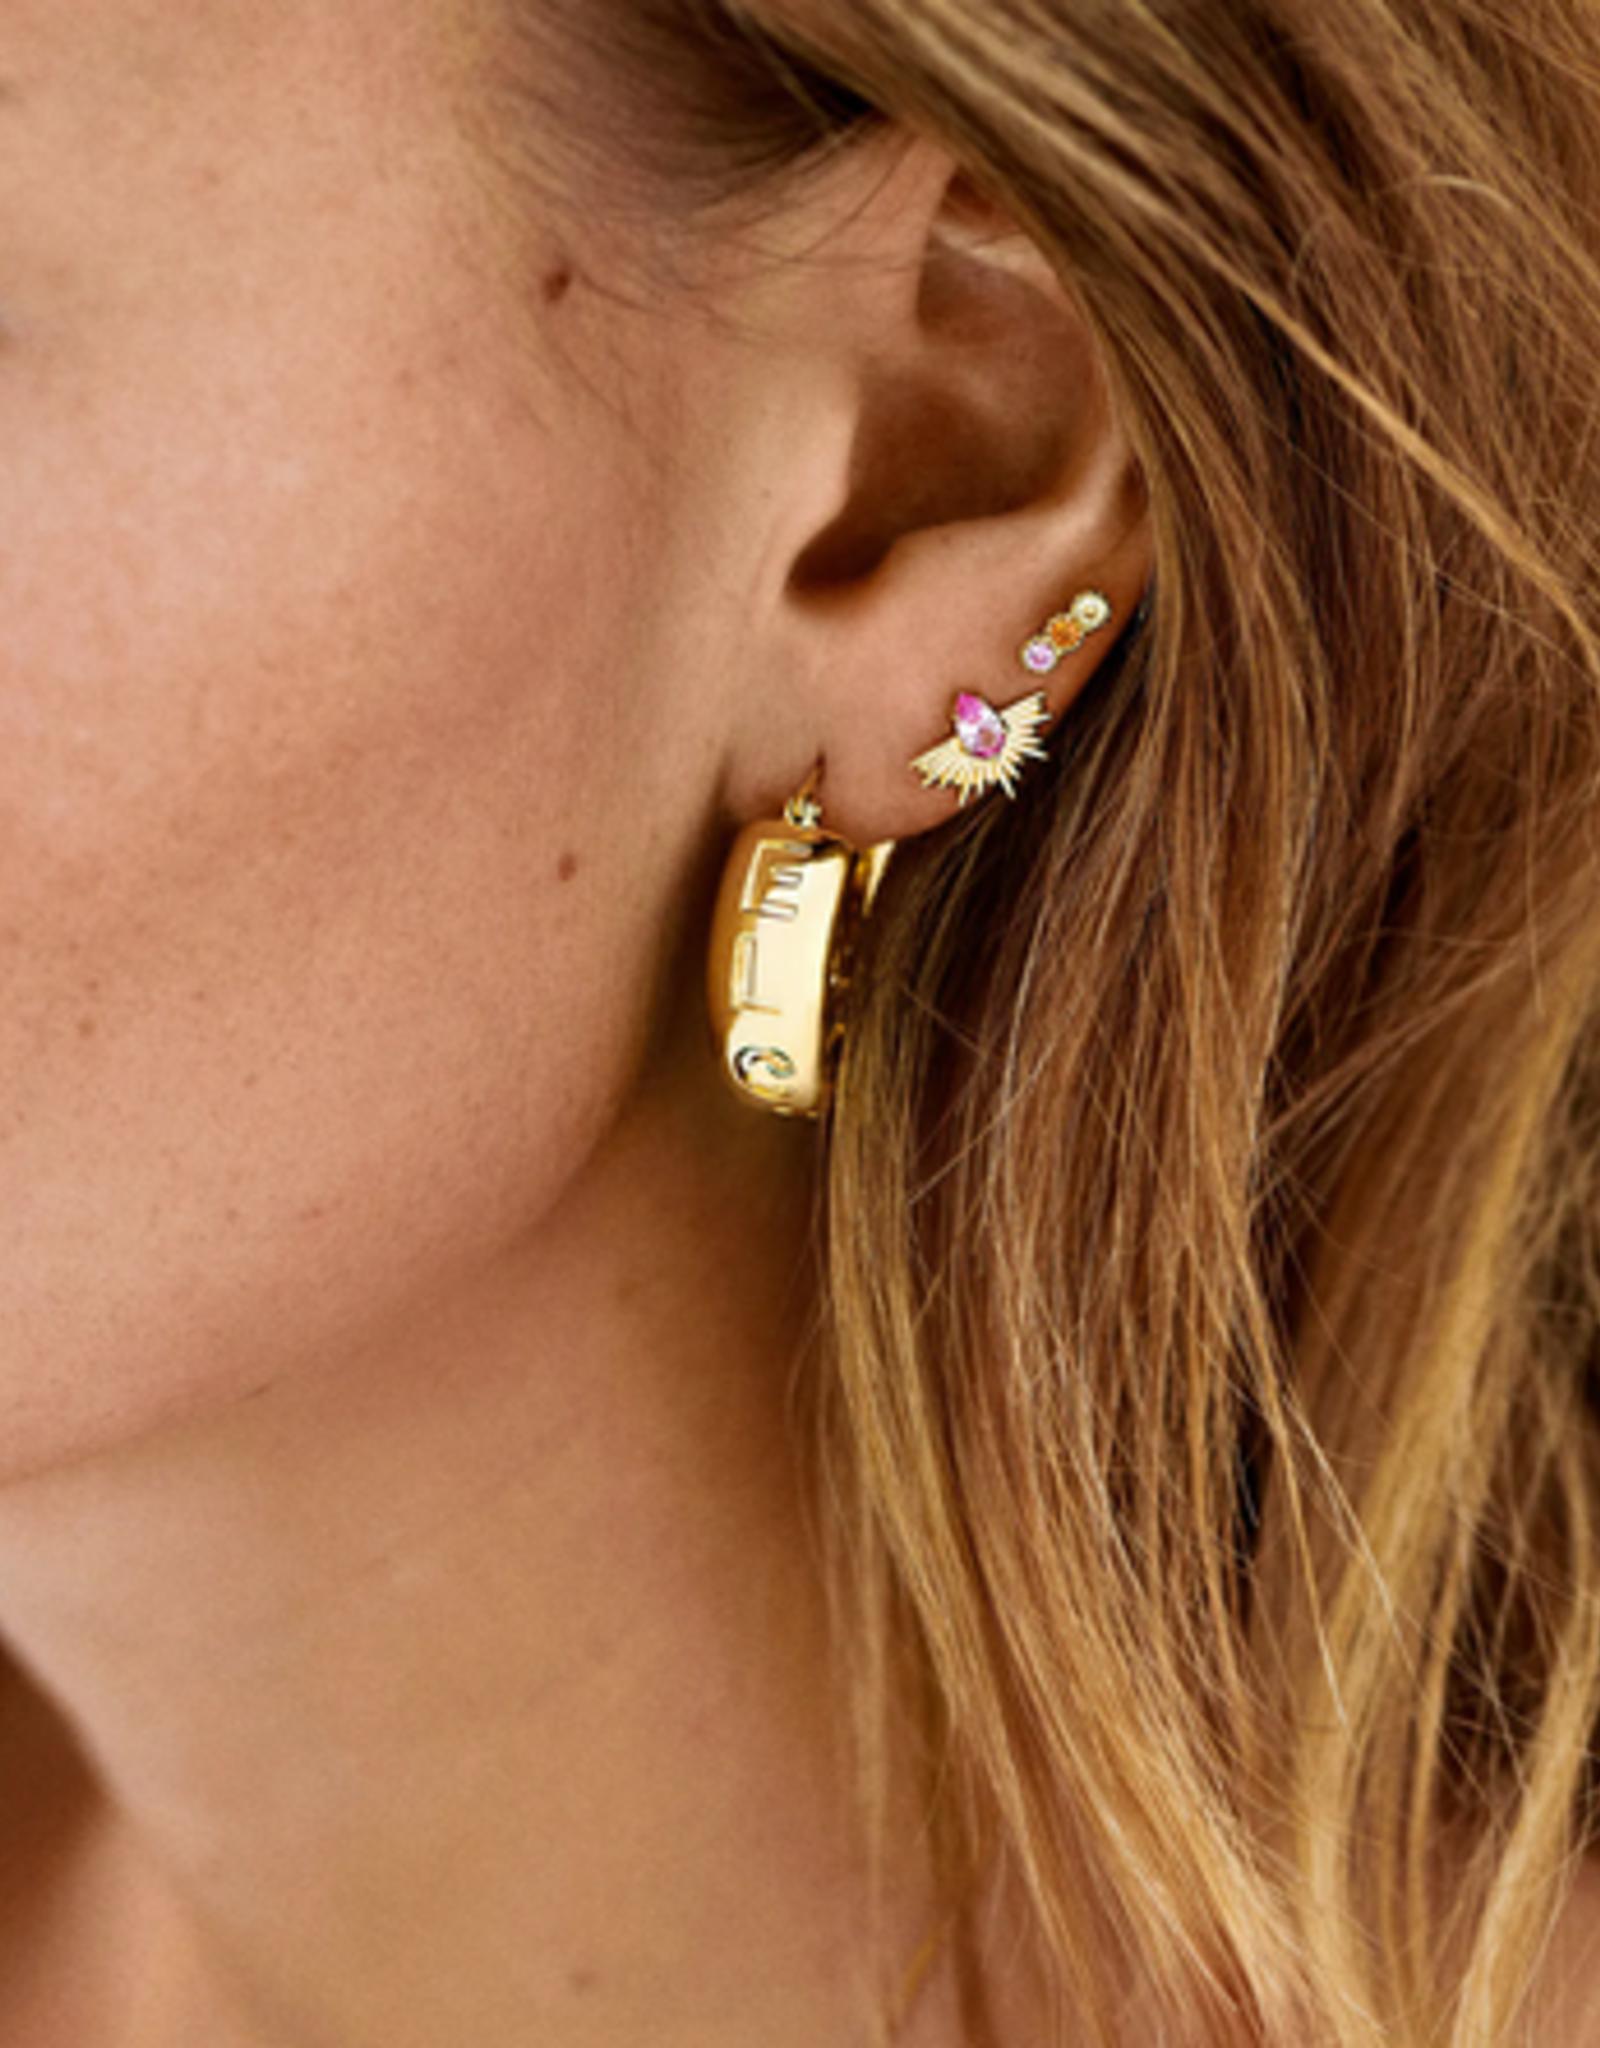 Anna + Nina Anna + Nina single rising sun stud earring silver goldplated